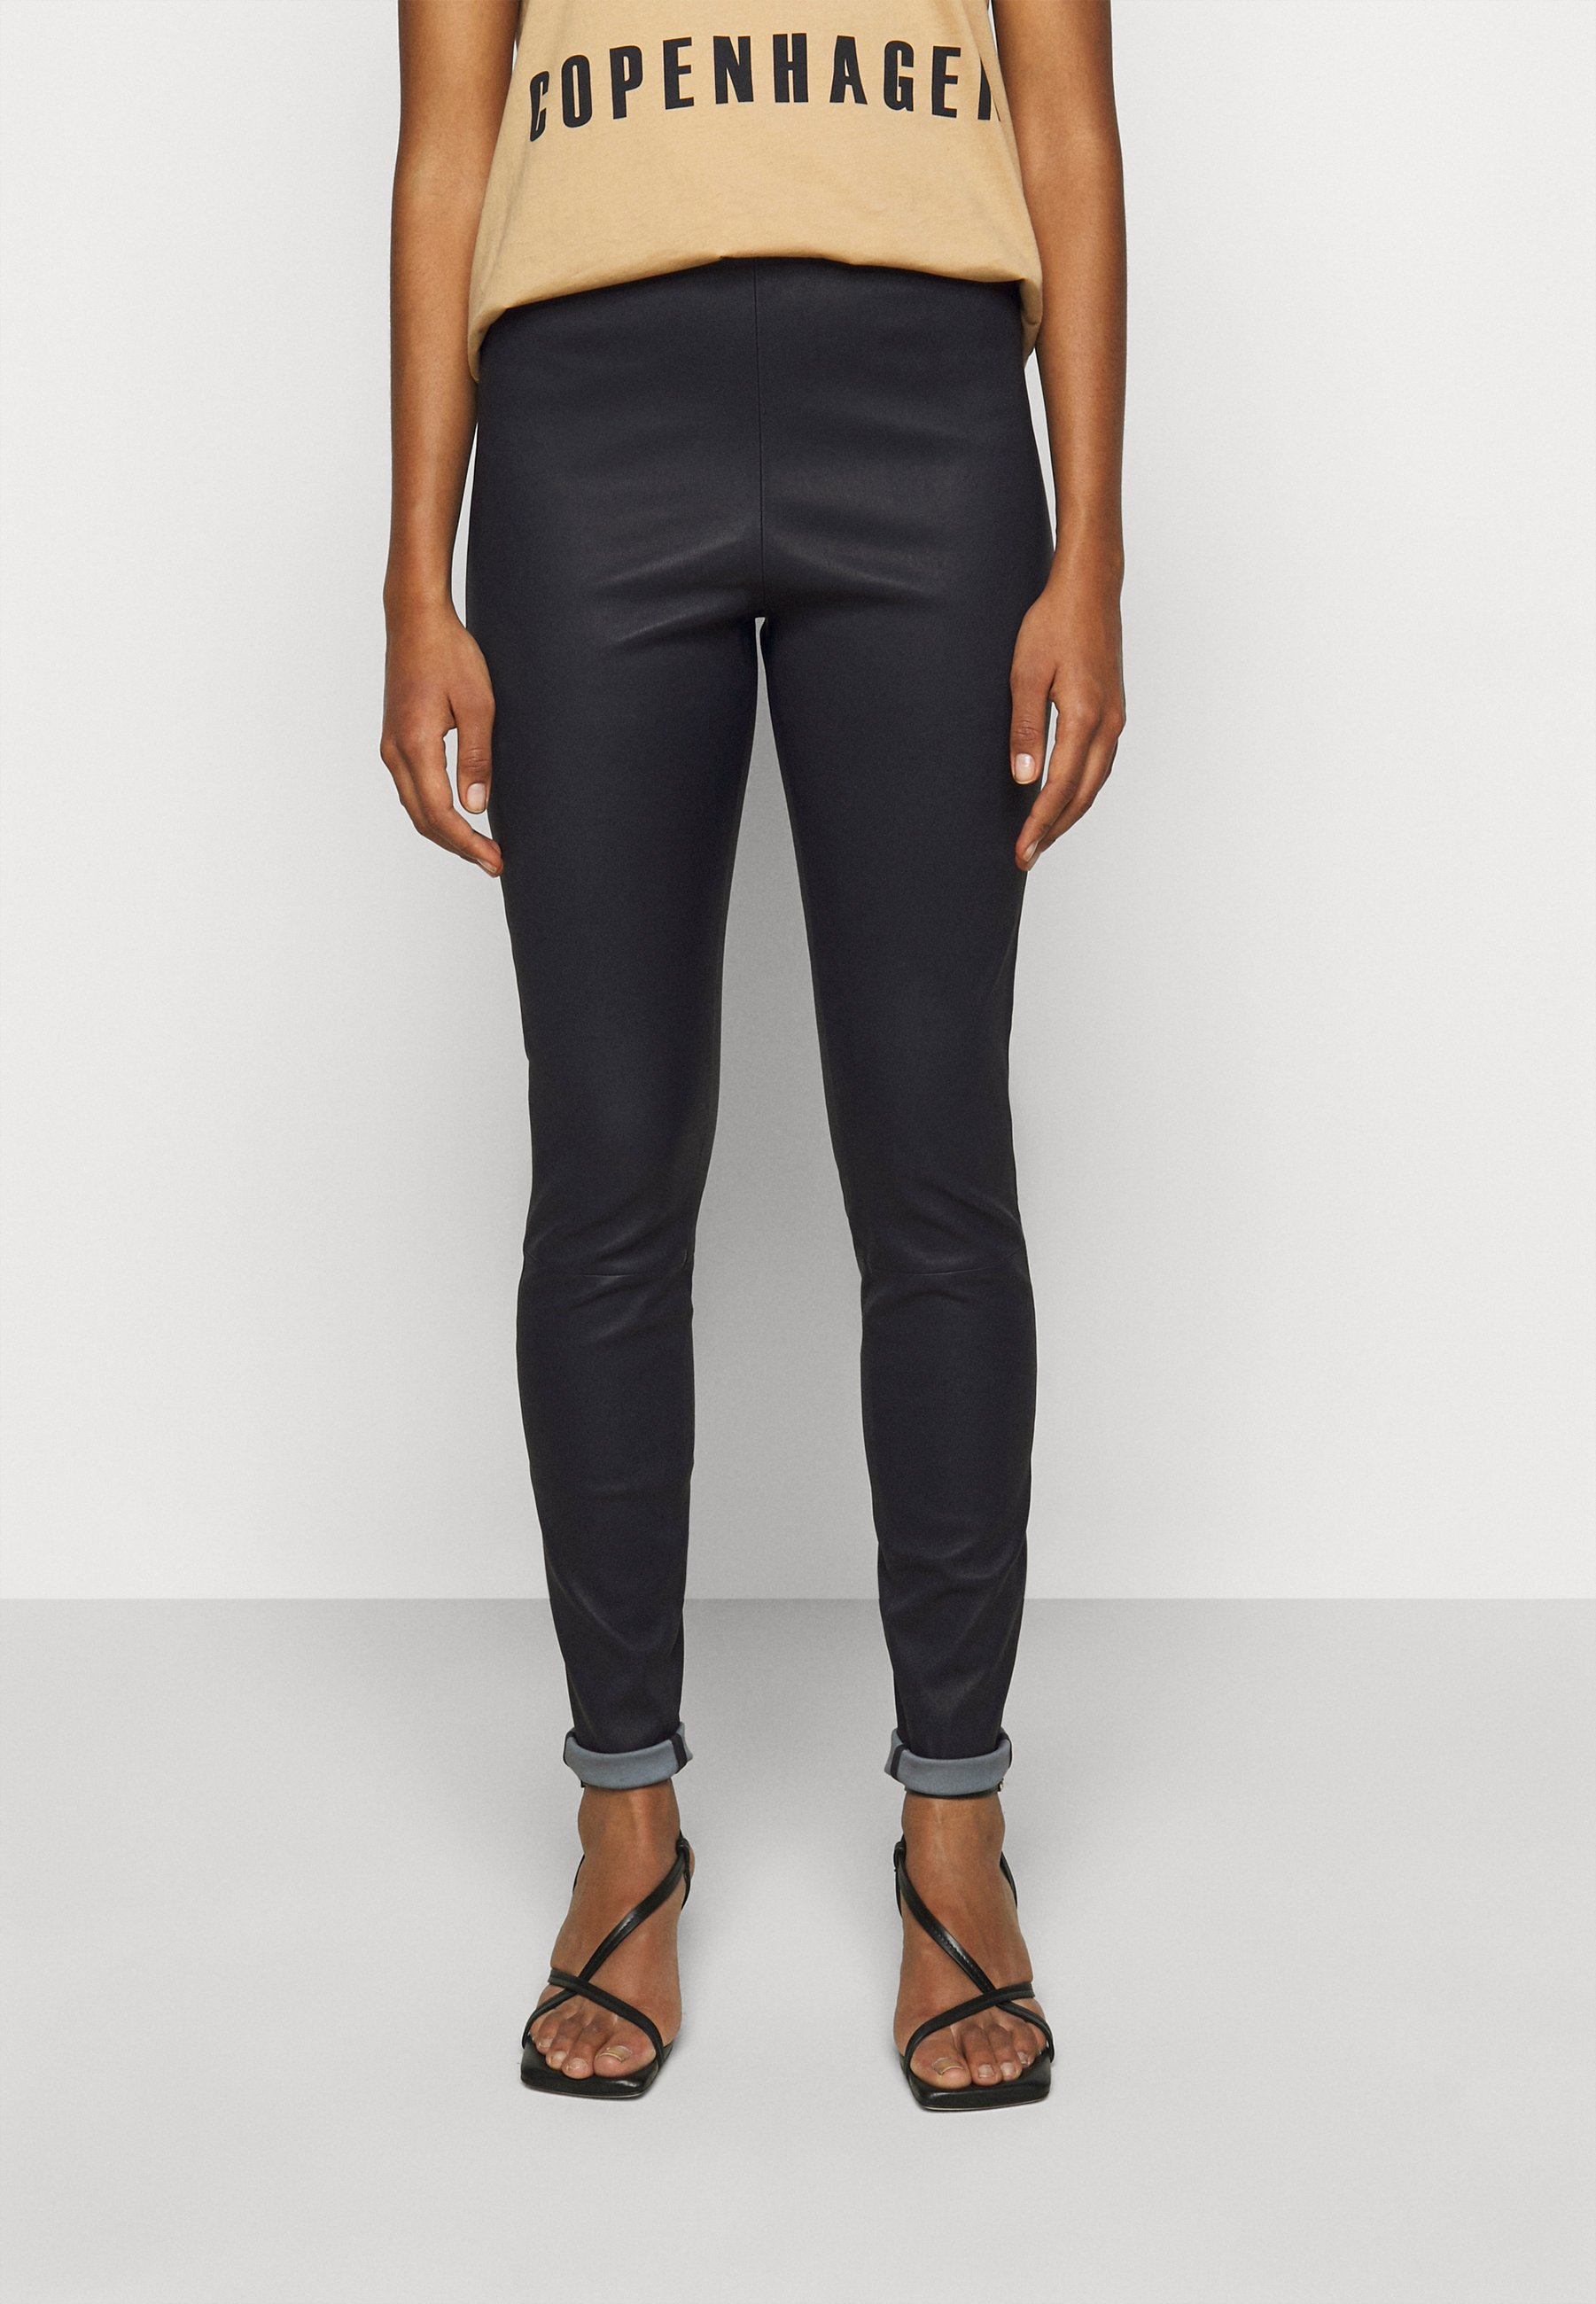 Women ELENASOO - Leggings - Trousers